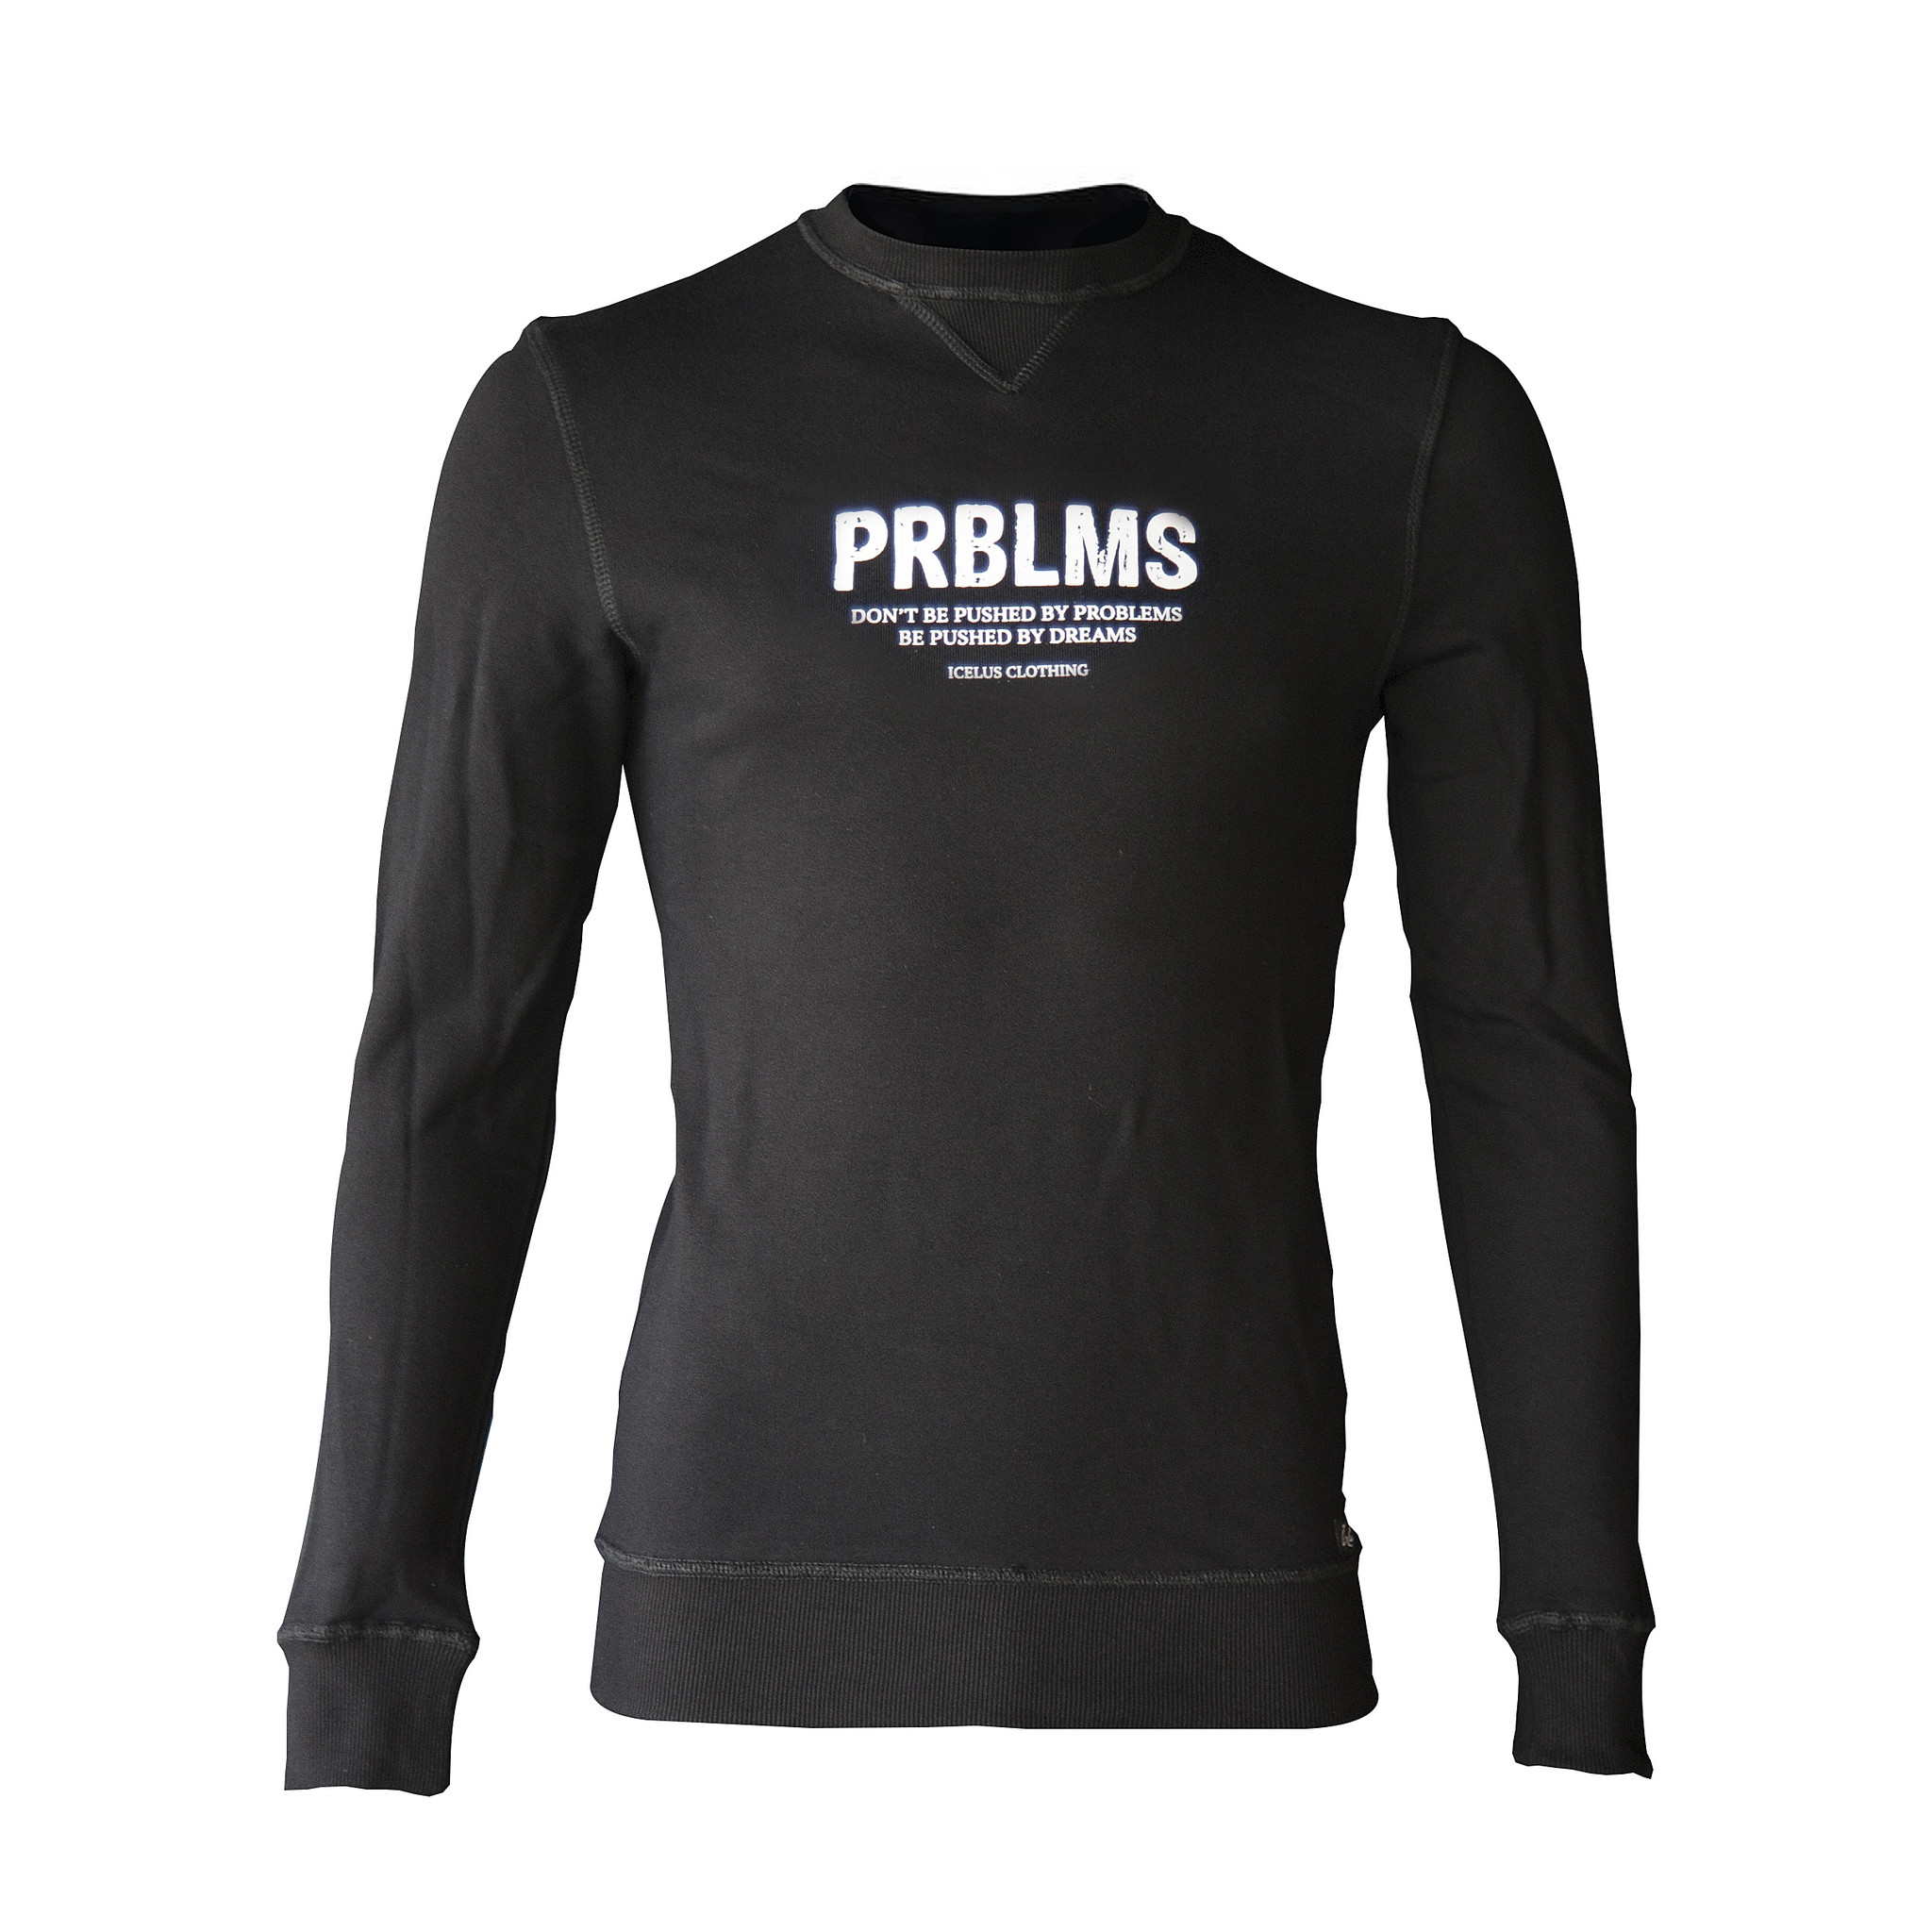 Icelus Clothing Prblms Sweater Black